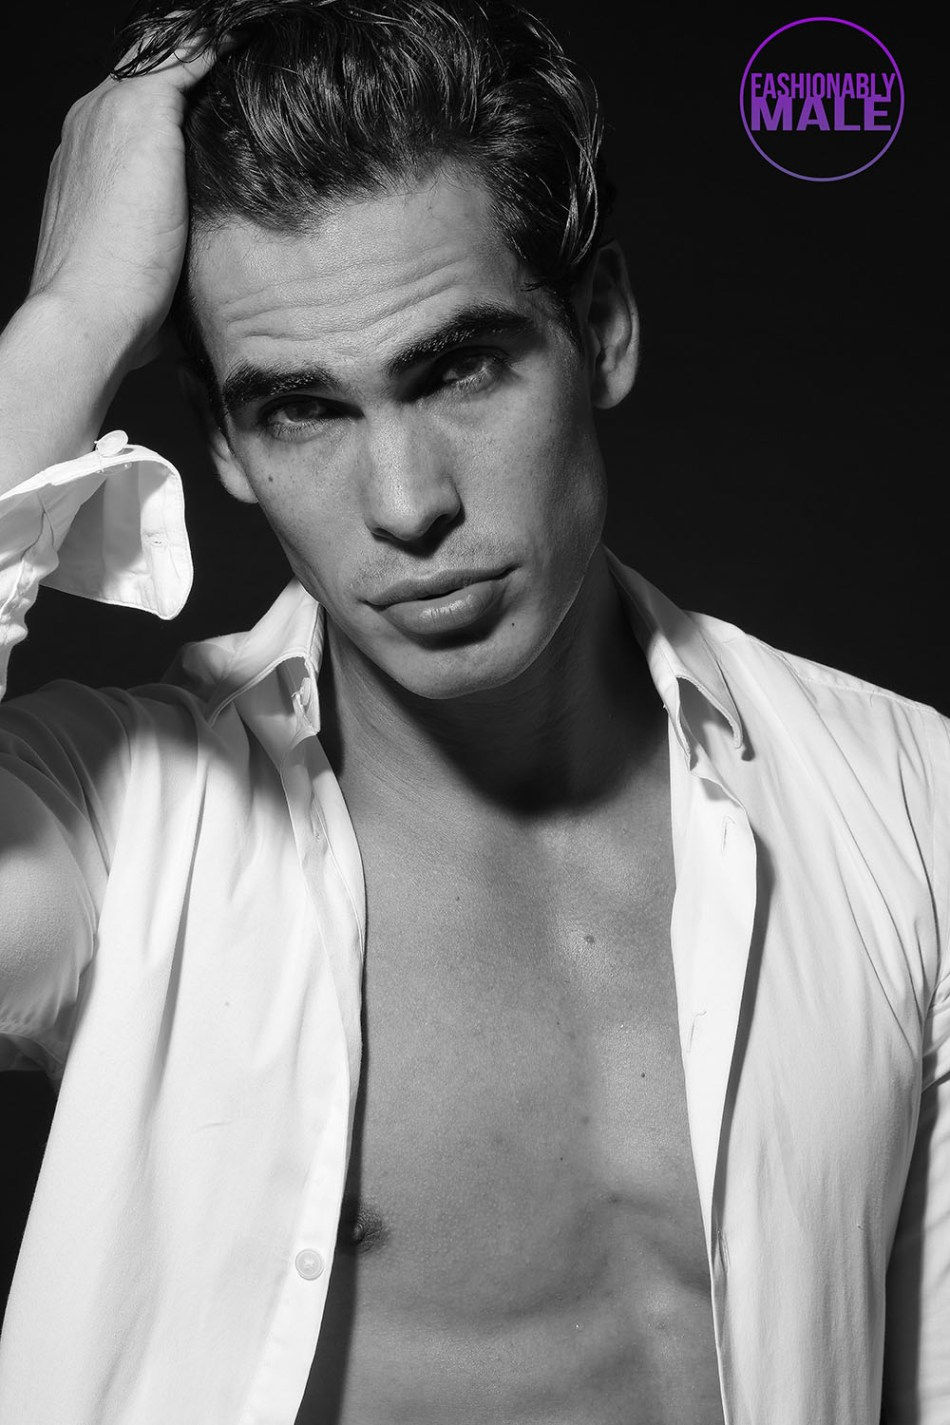 Felipe Villagrana by Afif Kattan for Fashionably Male2